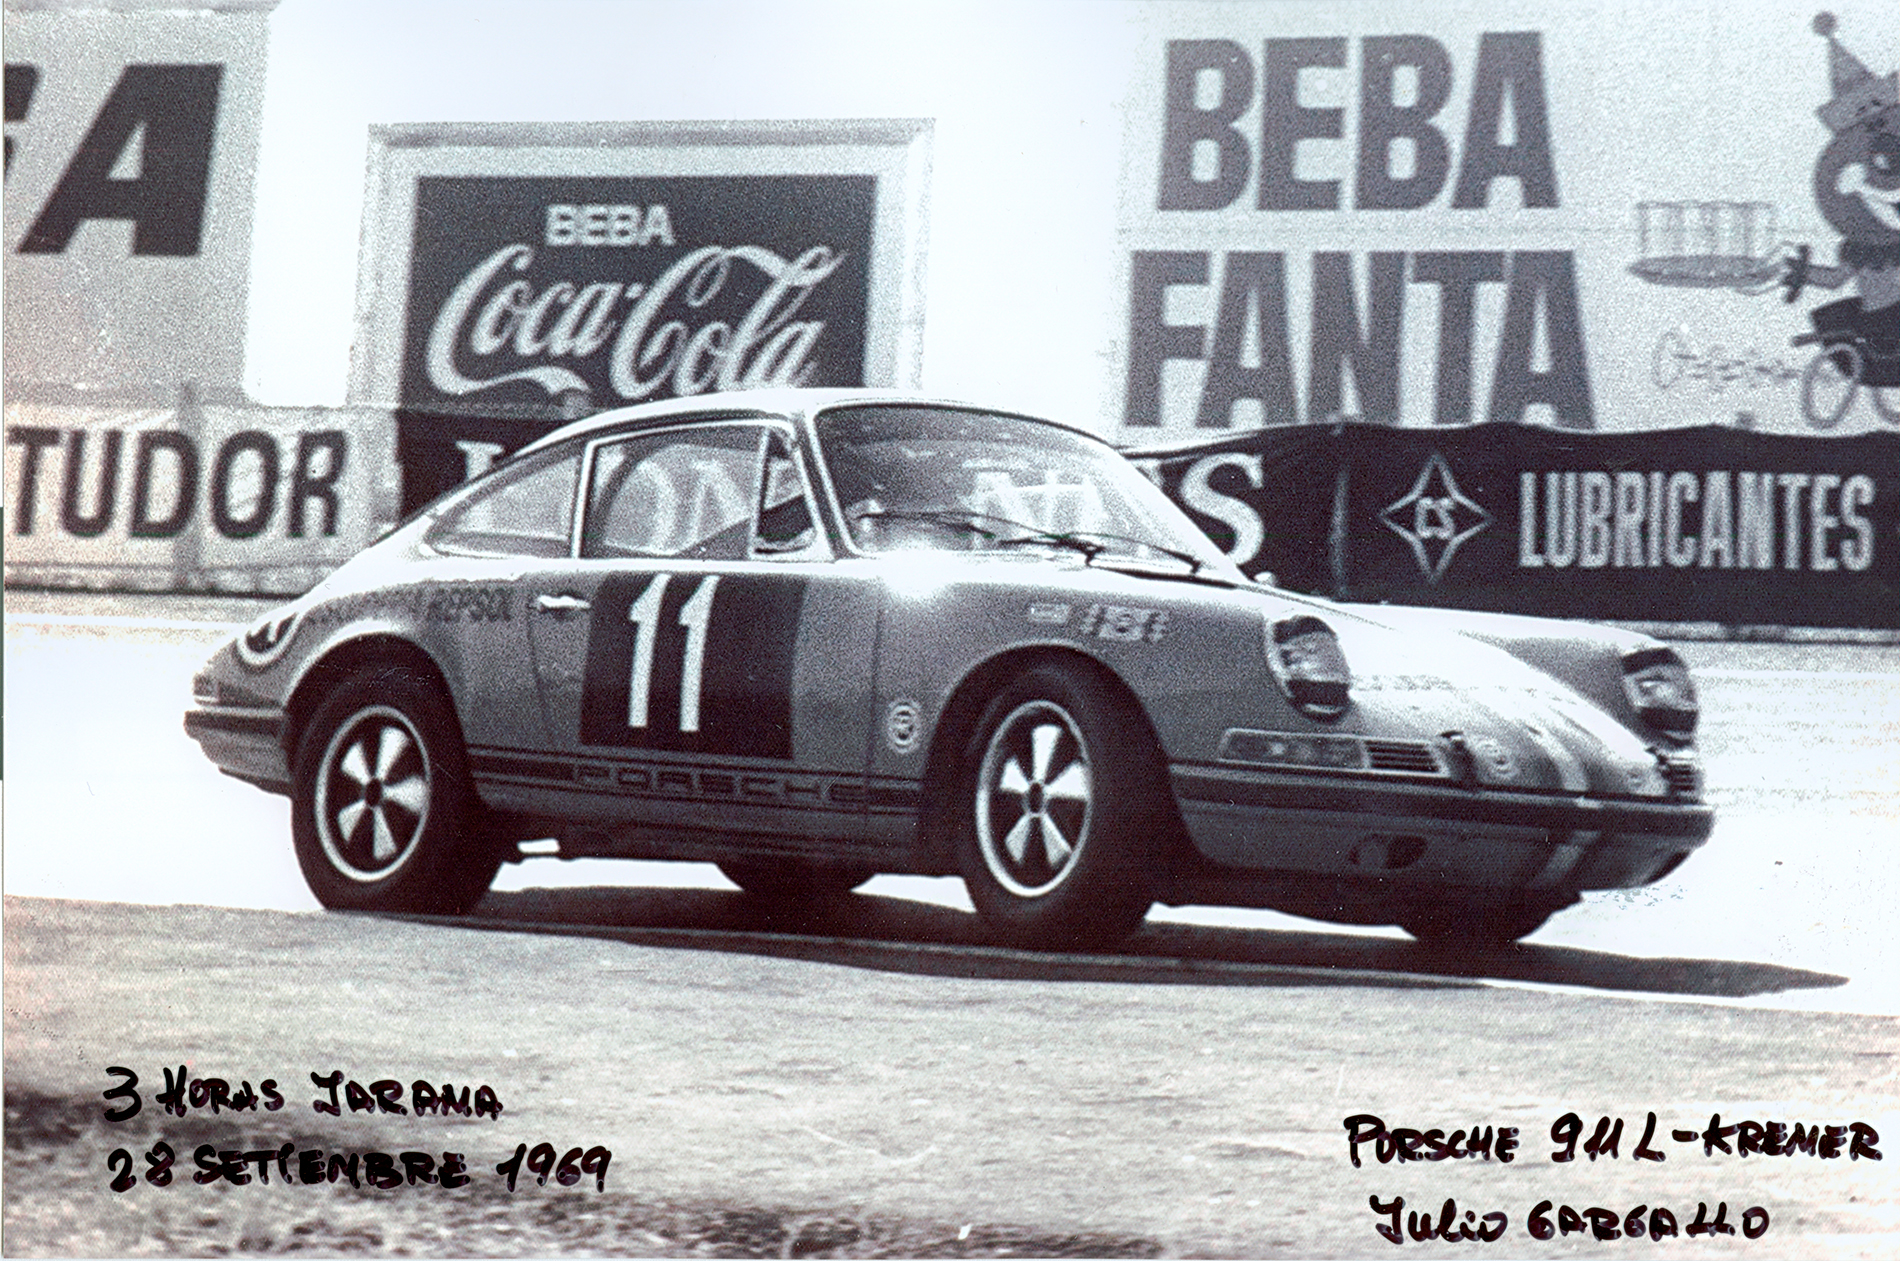 Circuito del Jarama - 1969 - J Gargallo - 3 horas Jarama - 911 - Kremer